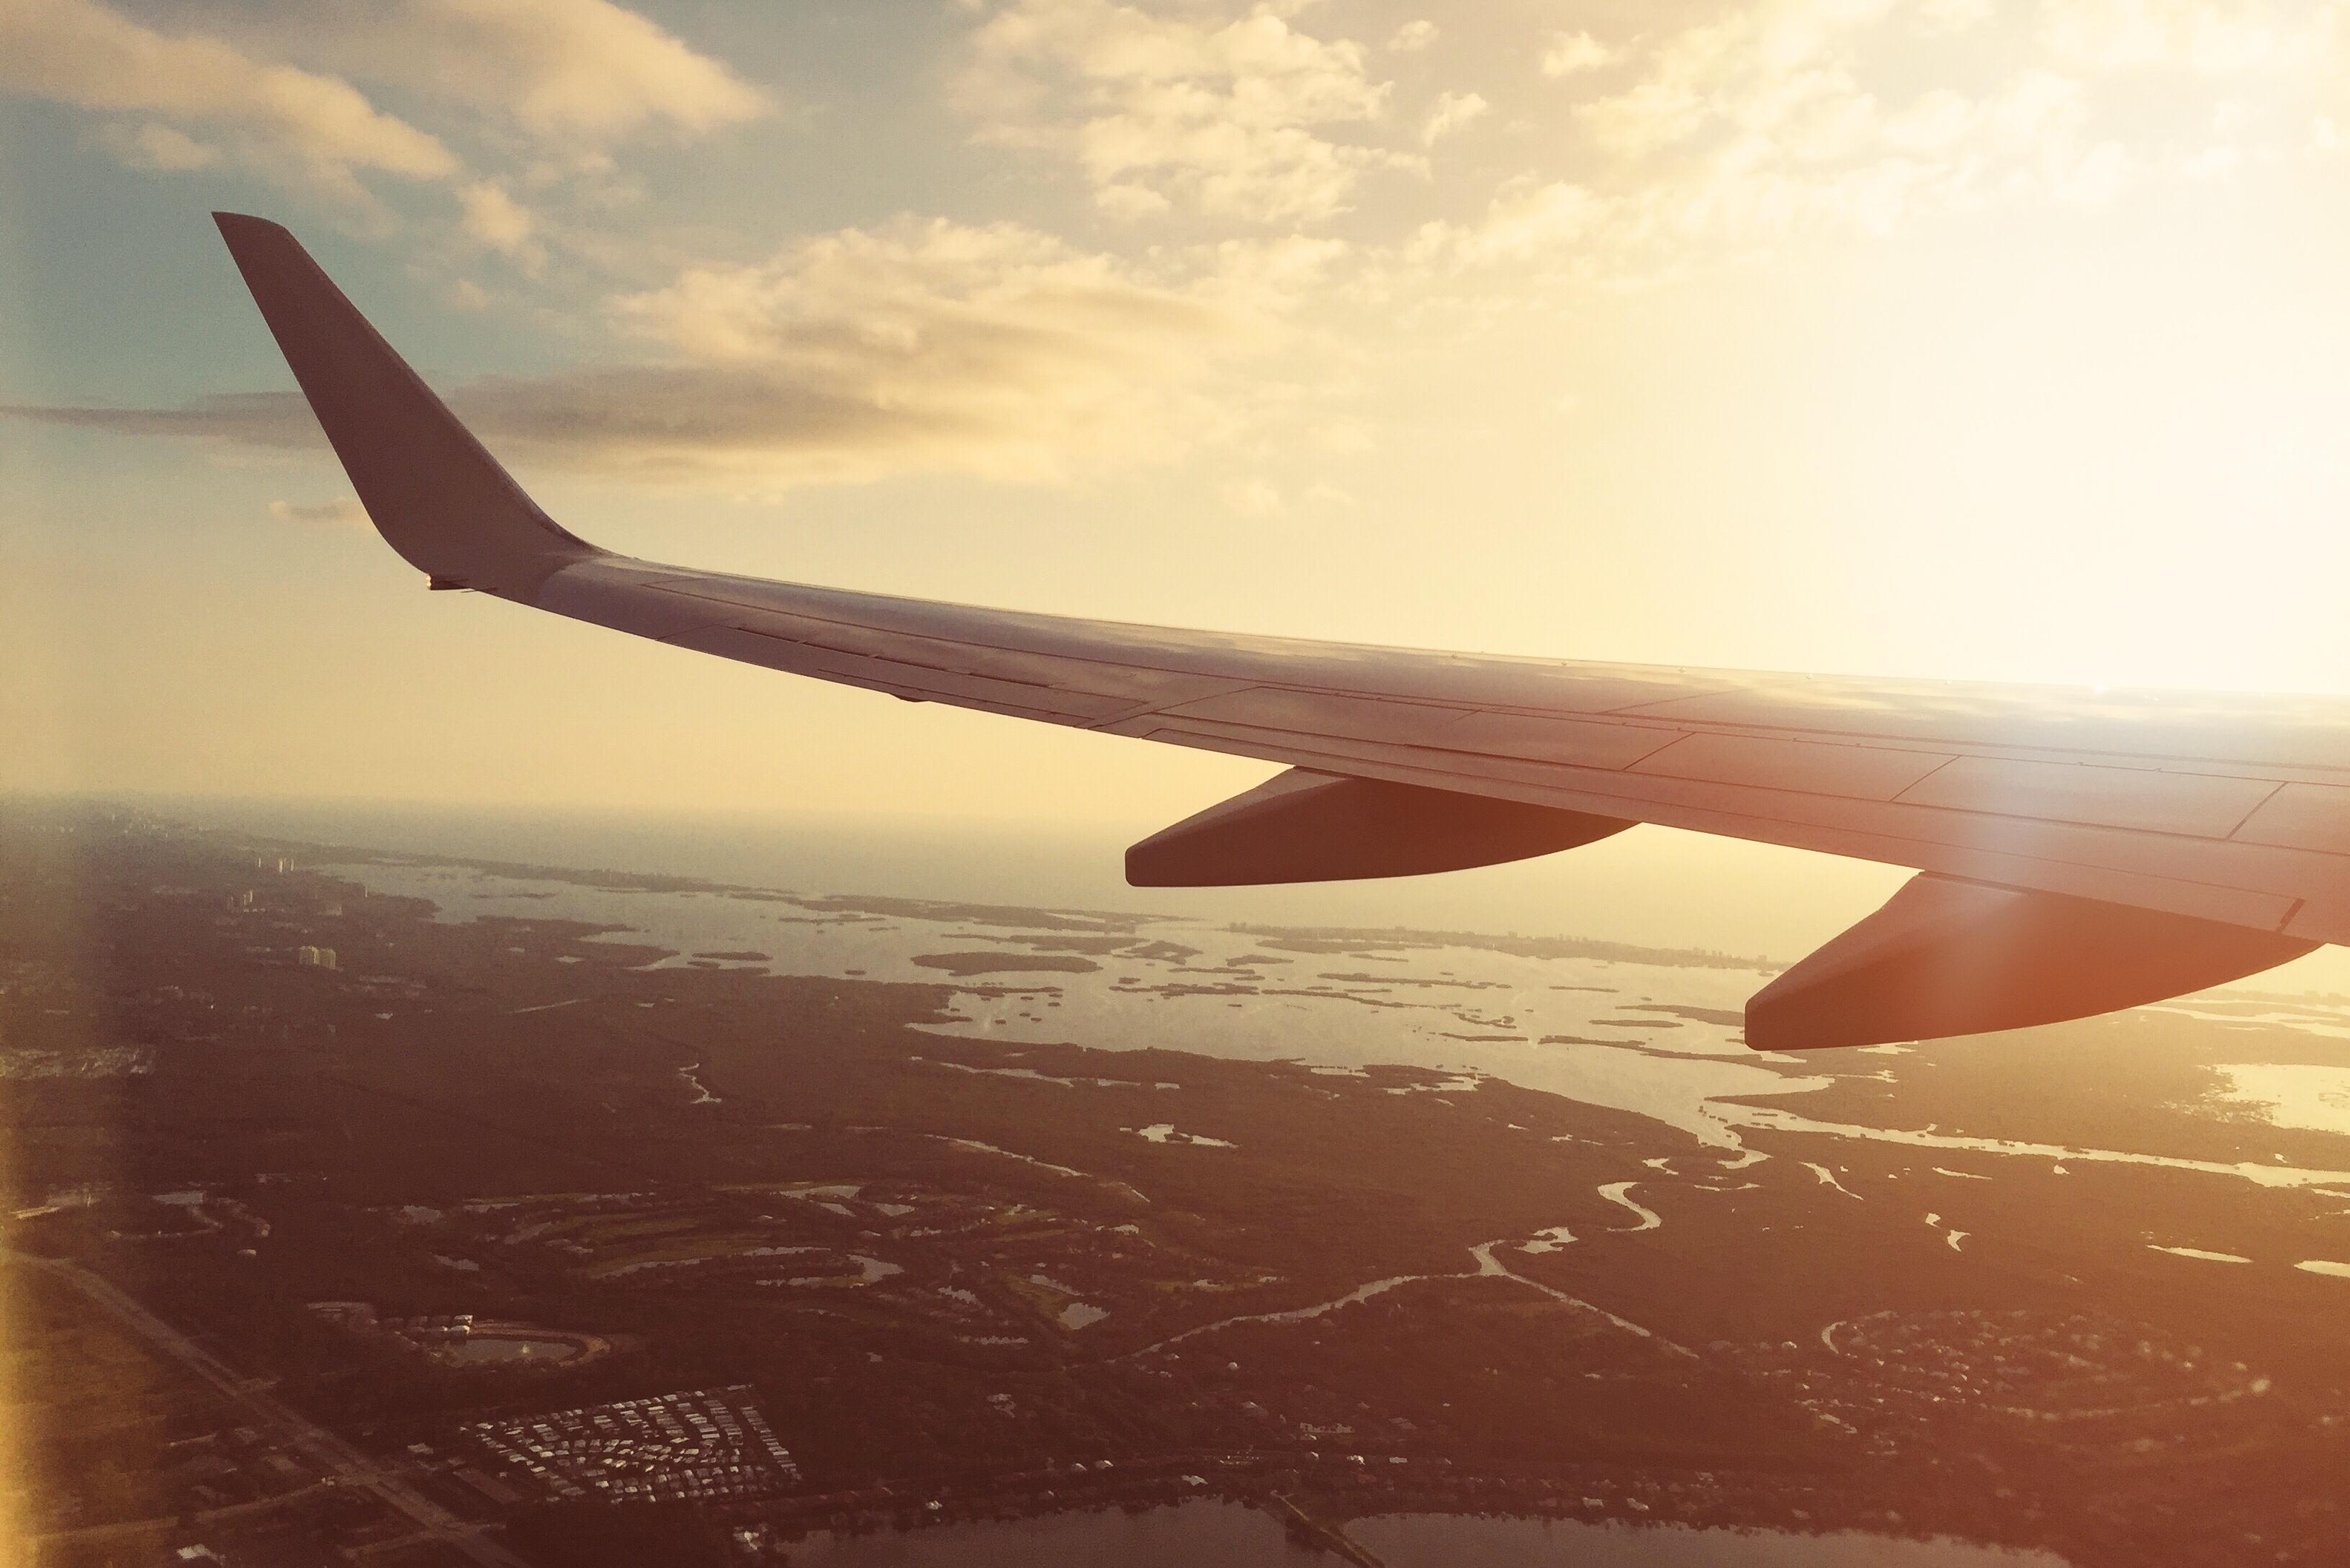 voyage weekend a l'étranger